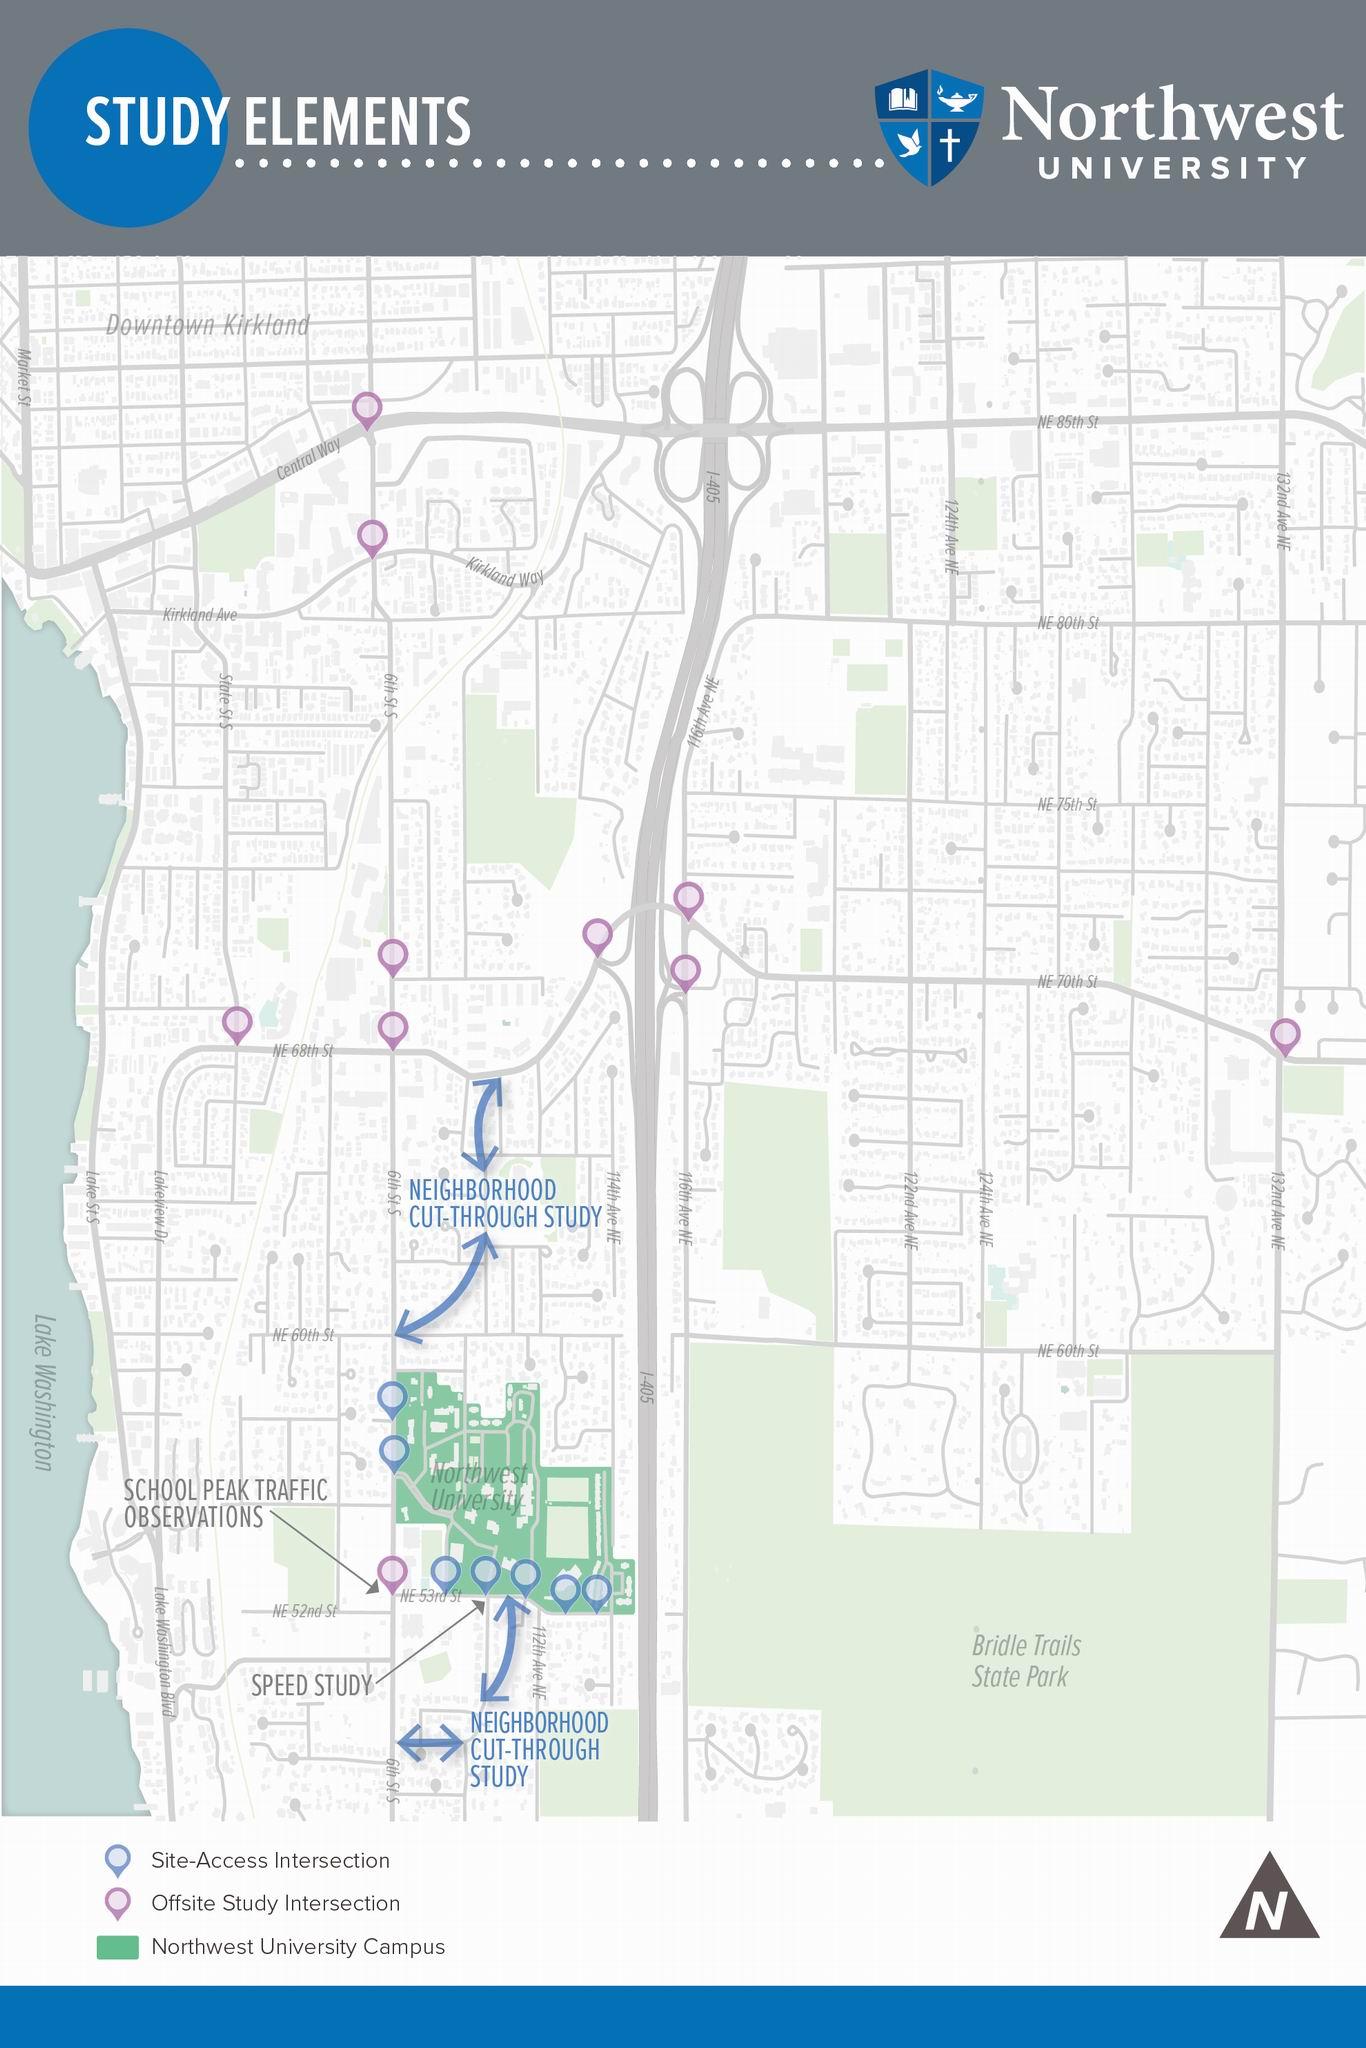 Traffic Study Area Map